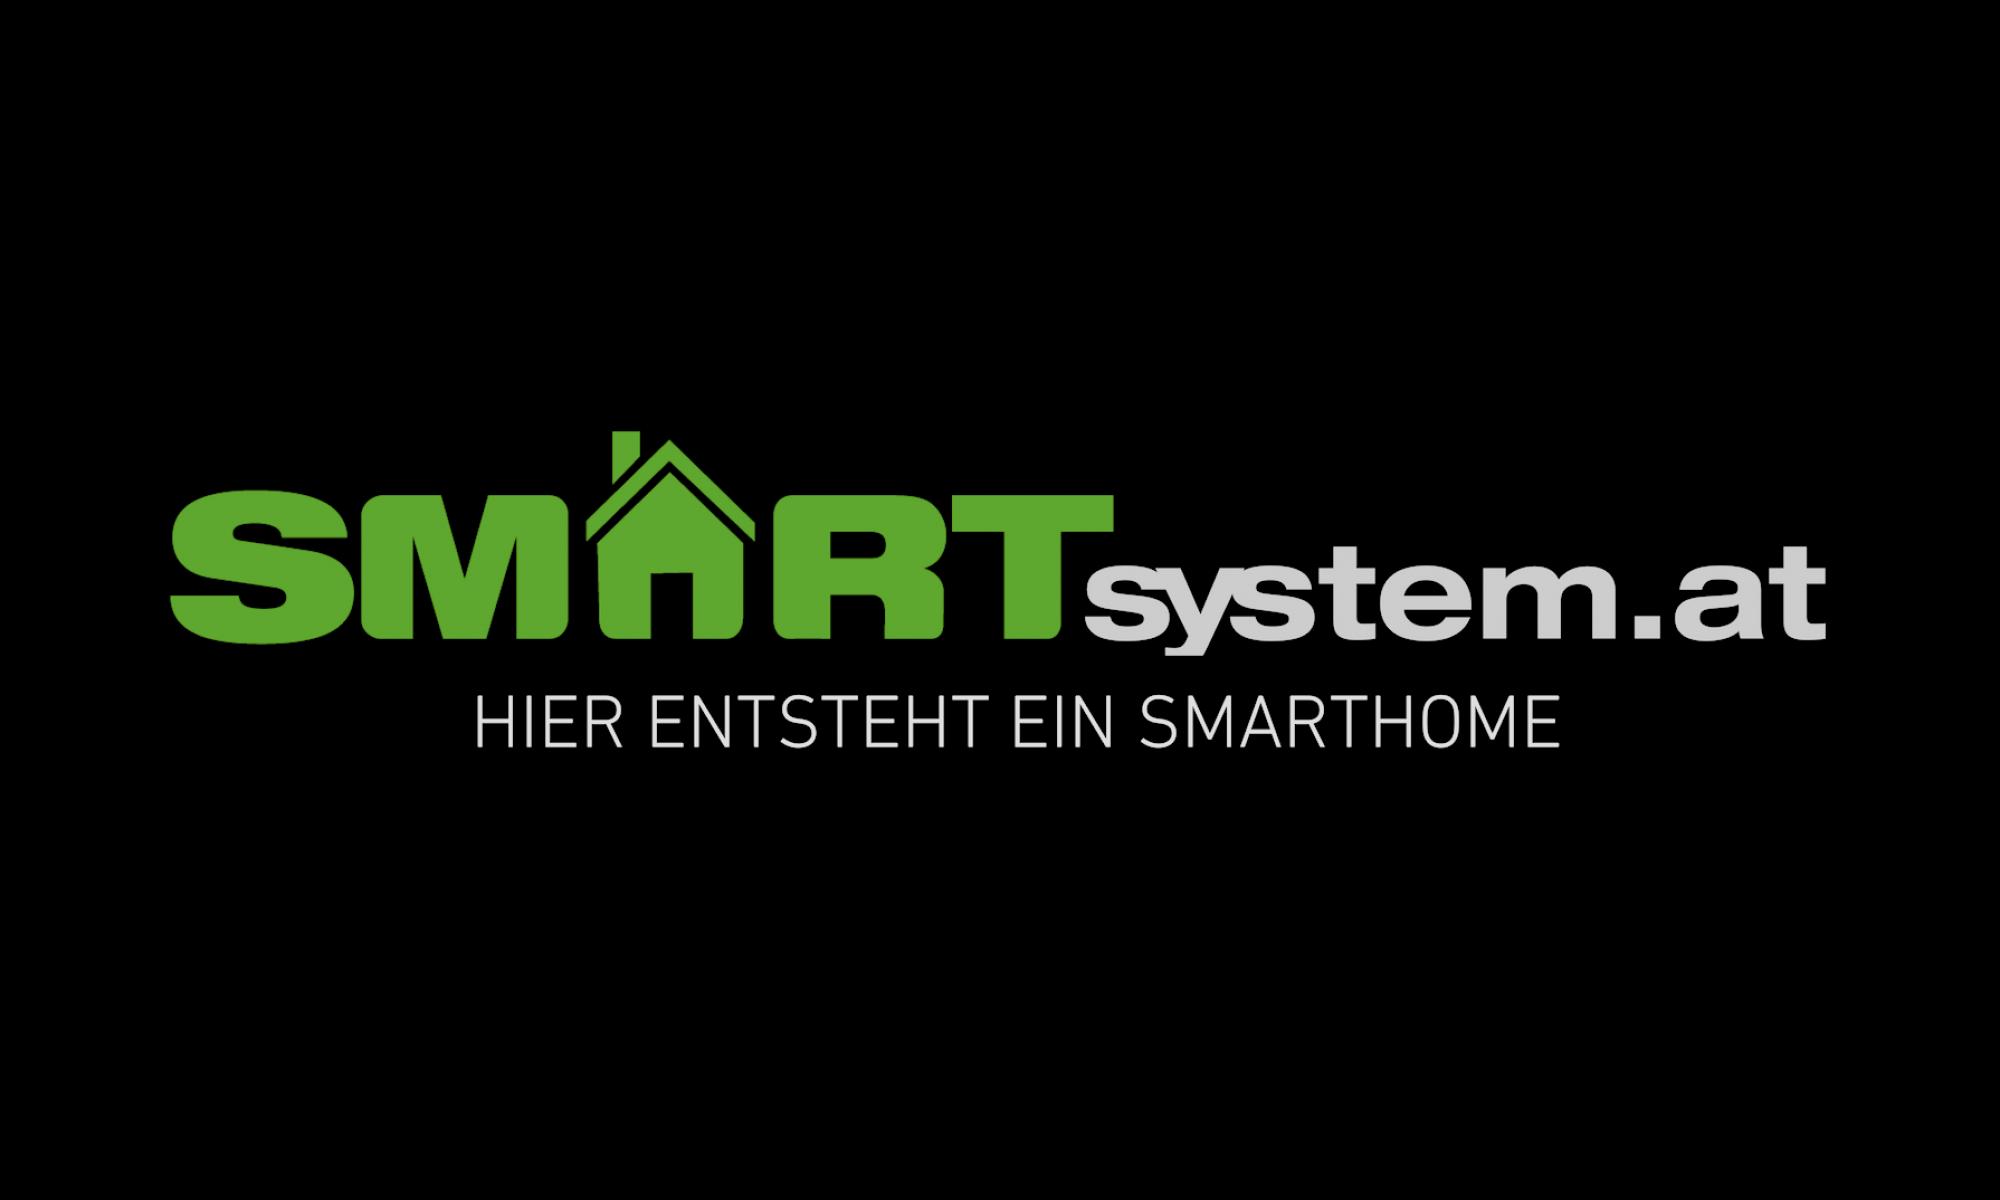 Smart System